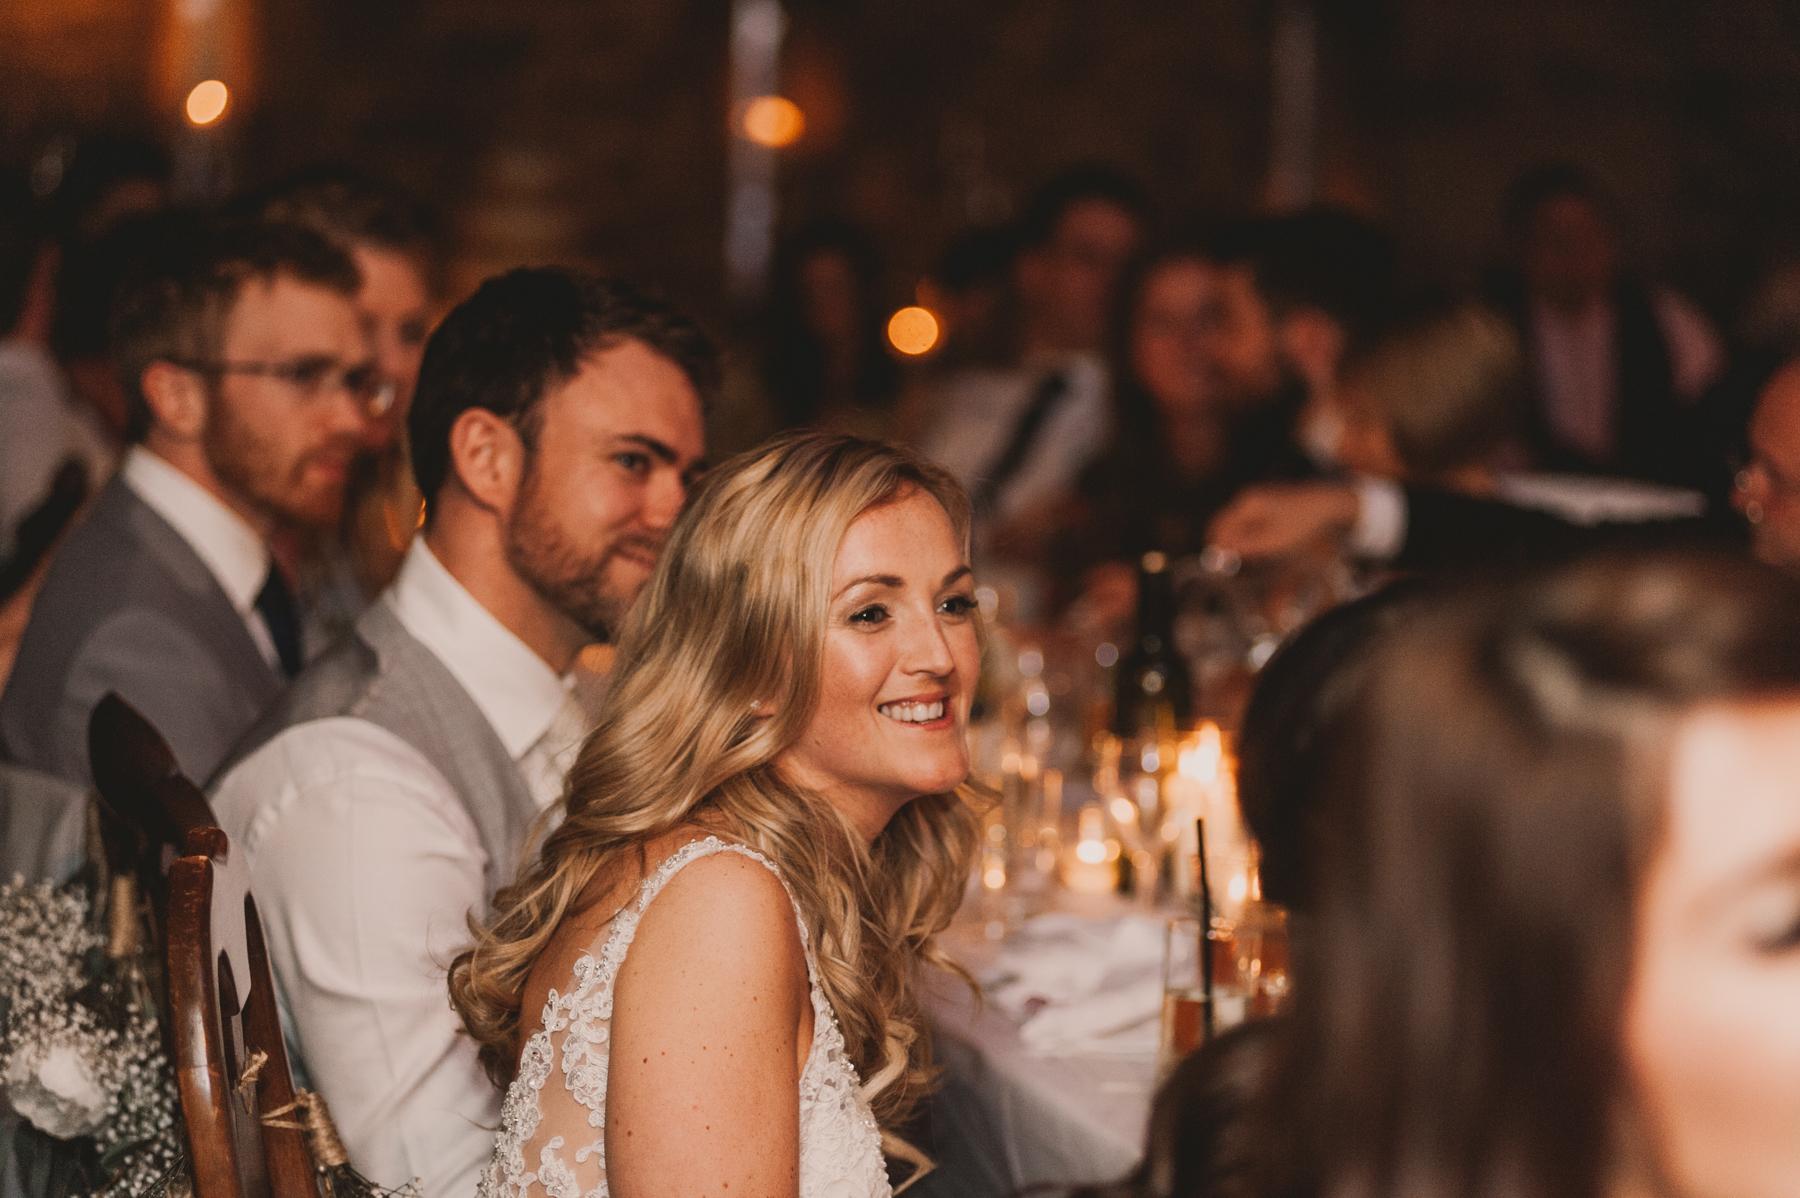 Herefordshire-barn-wedding-highlights-117.jpg